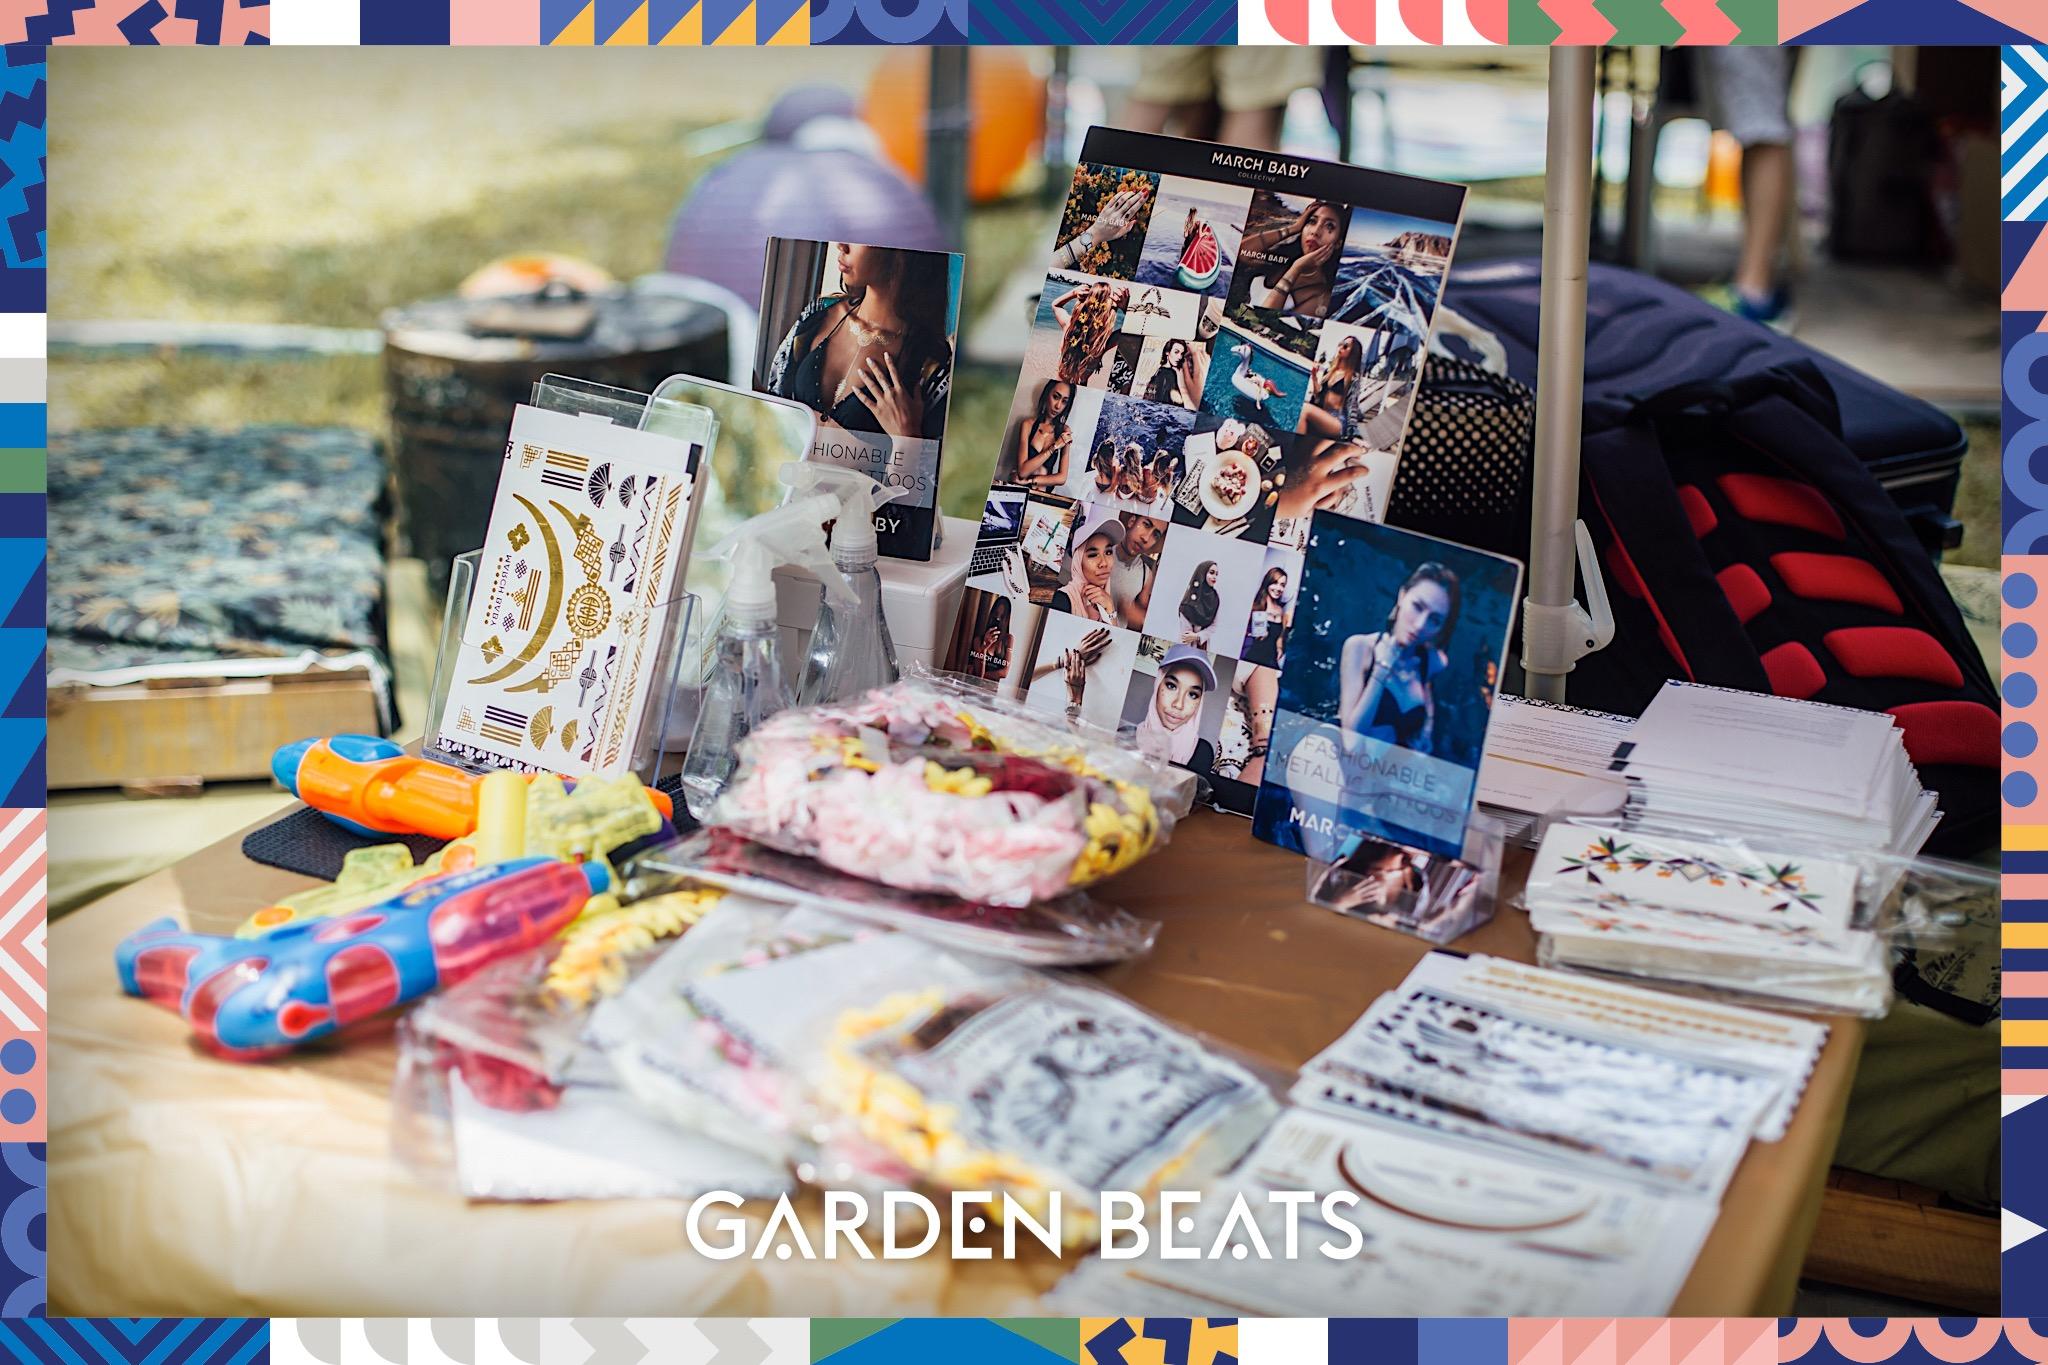 18032017_GardenBeats_Colossal087_WatermarkedGB.jpg